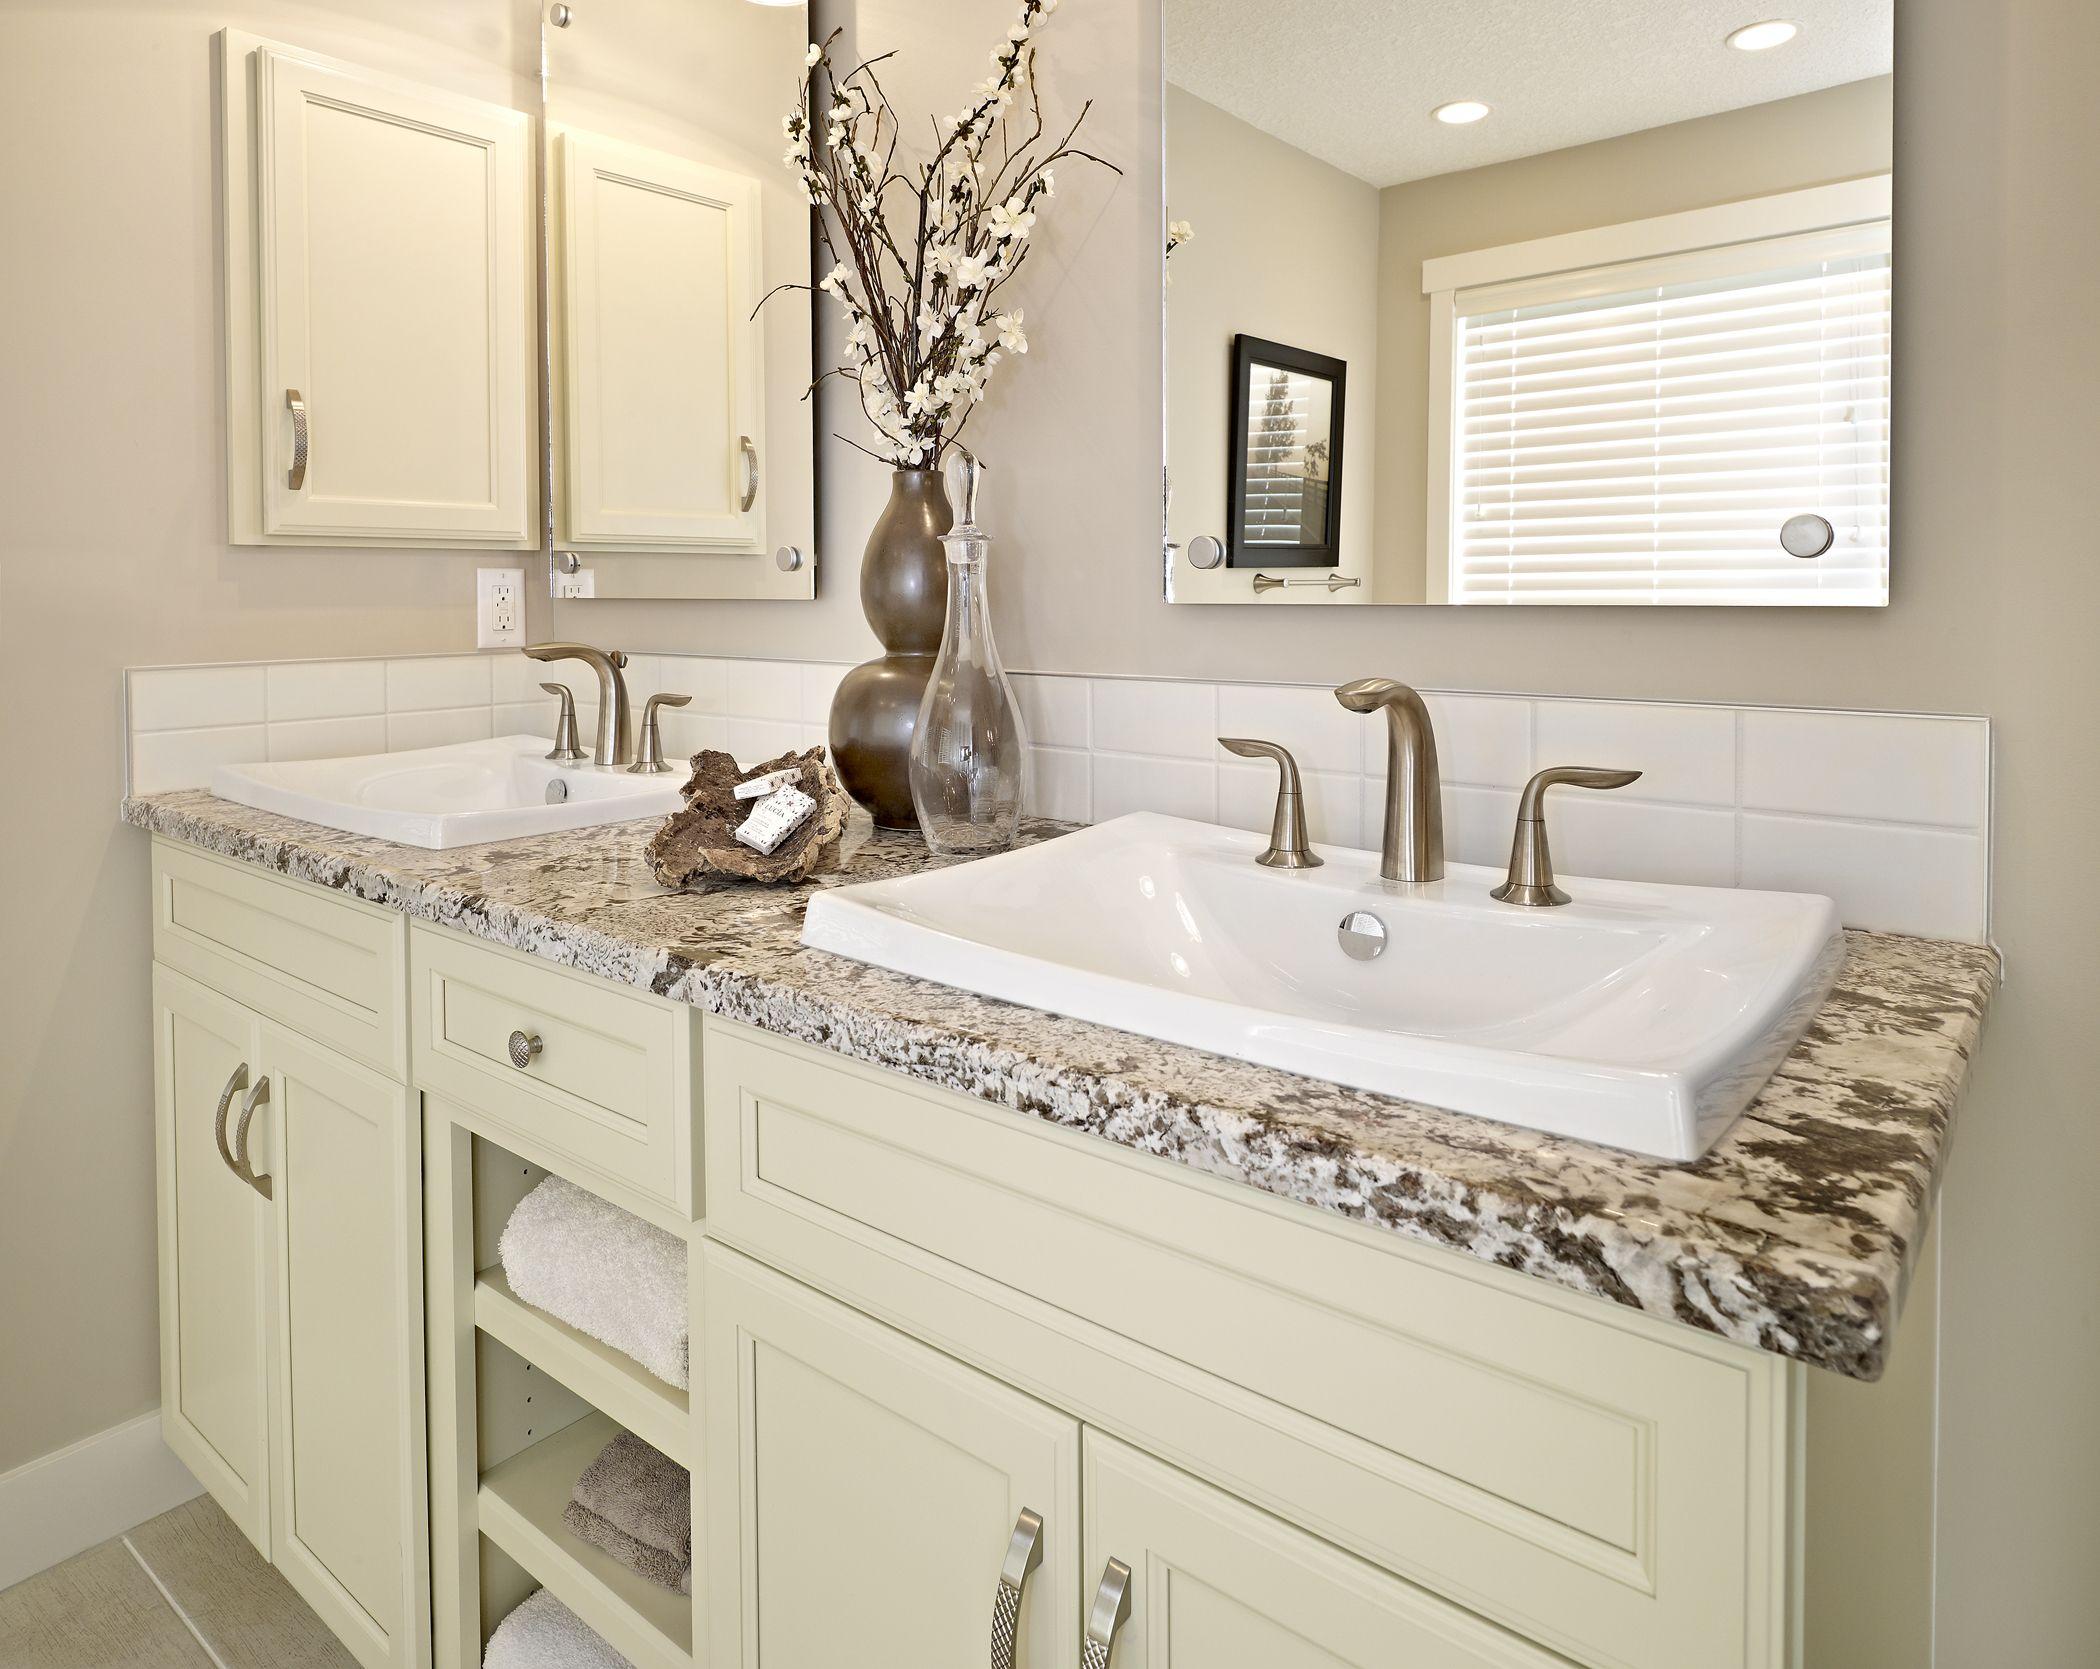 Bathroom Cabinets Edmonton 26 hawthorne southfork - in southfork - home details - homes